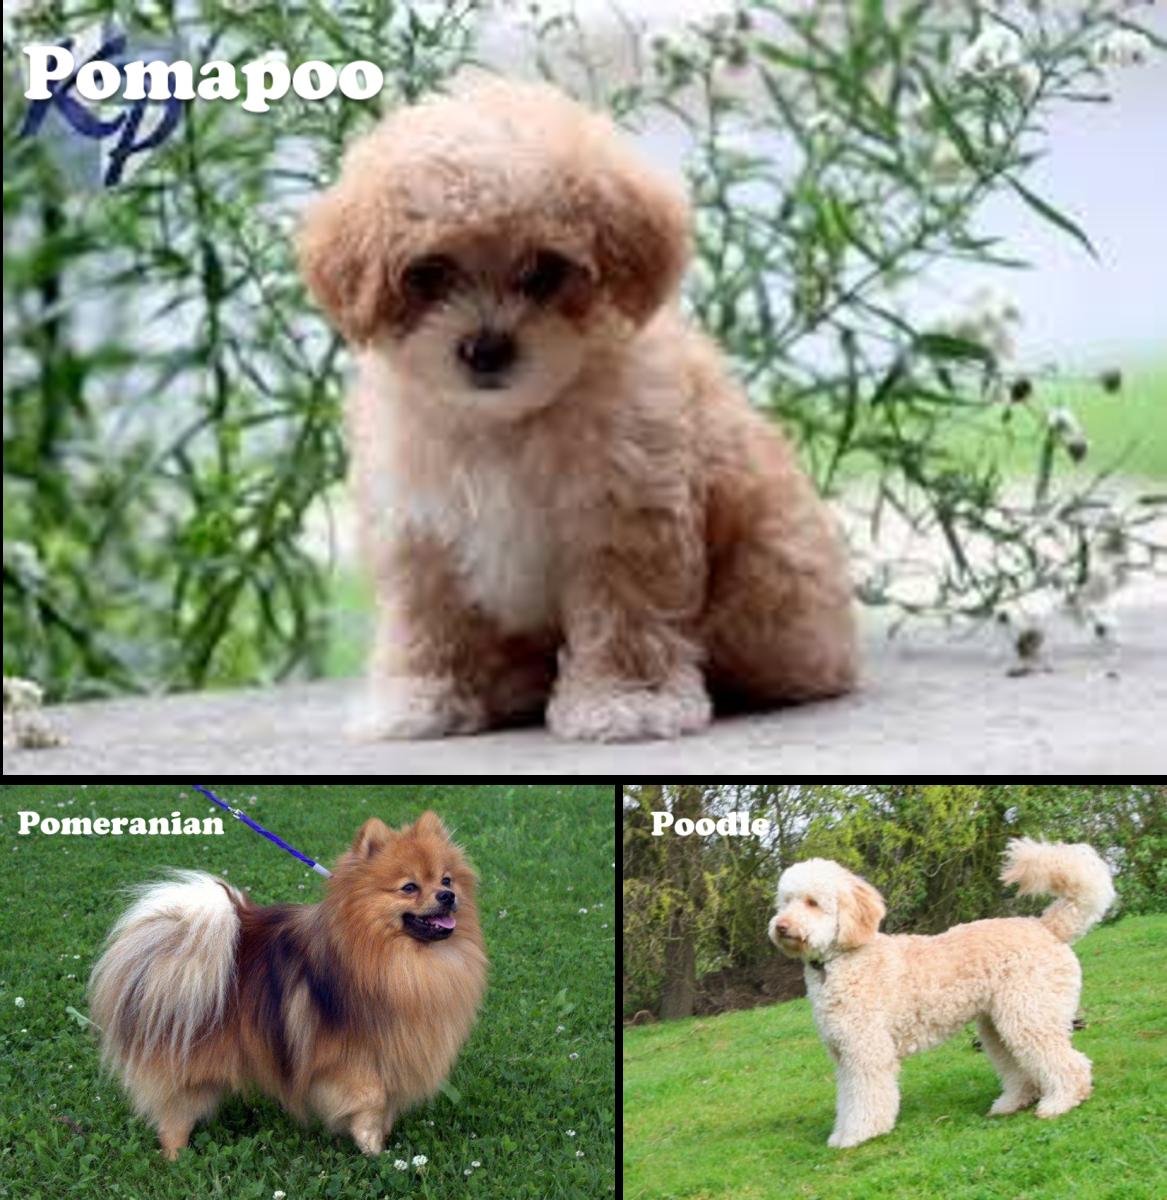 Pomapoo (Pomeranian / Poodle Mix)